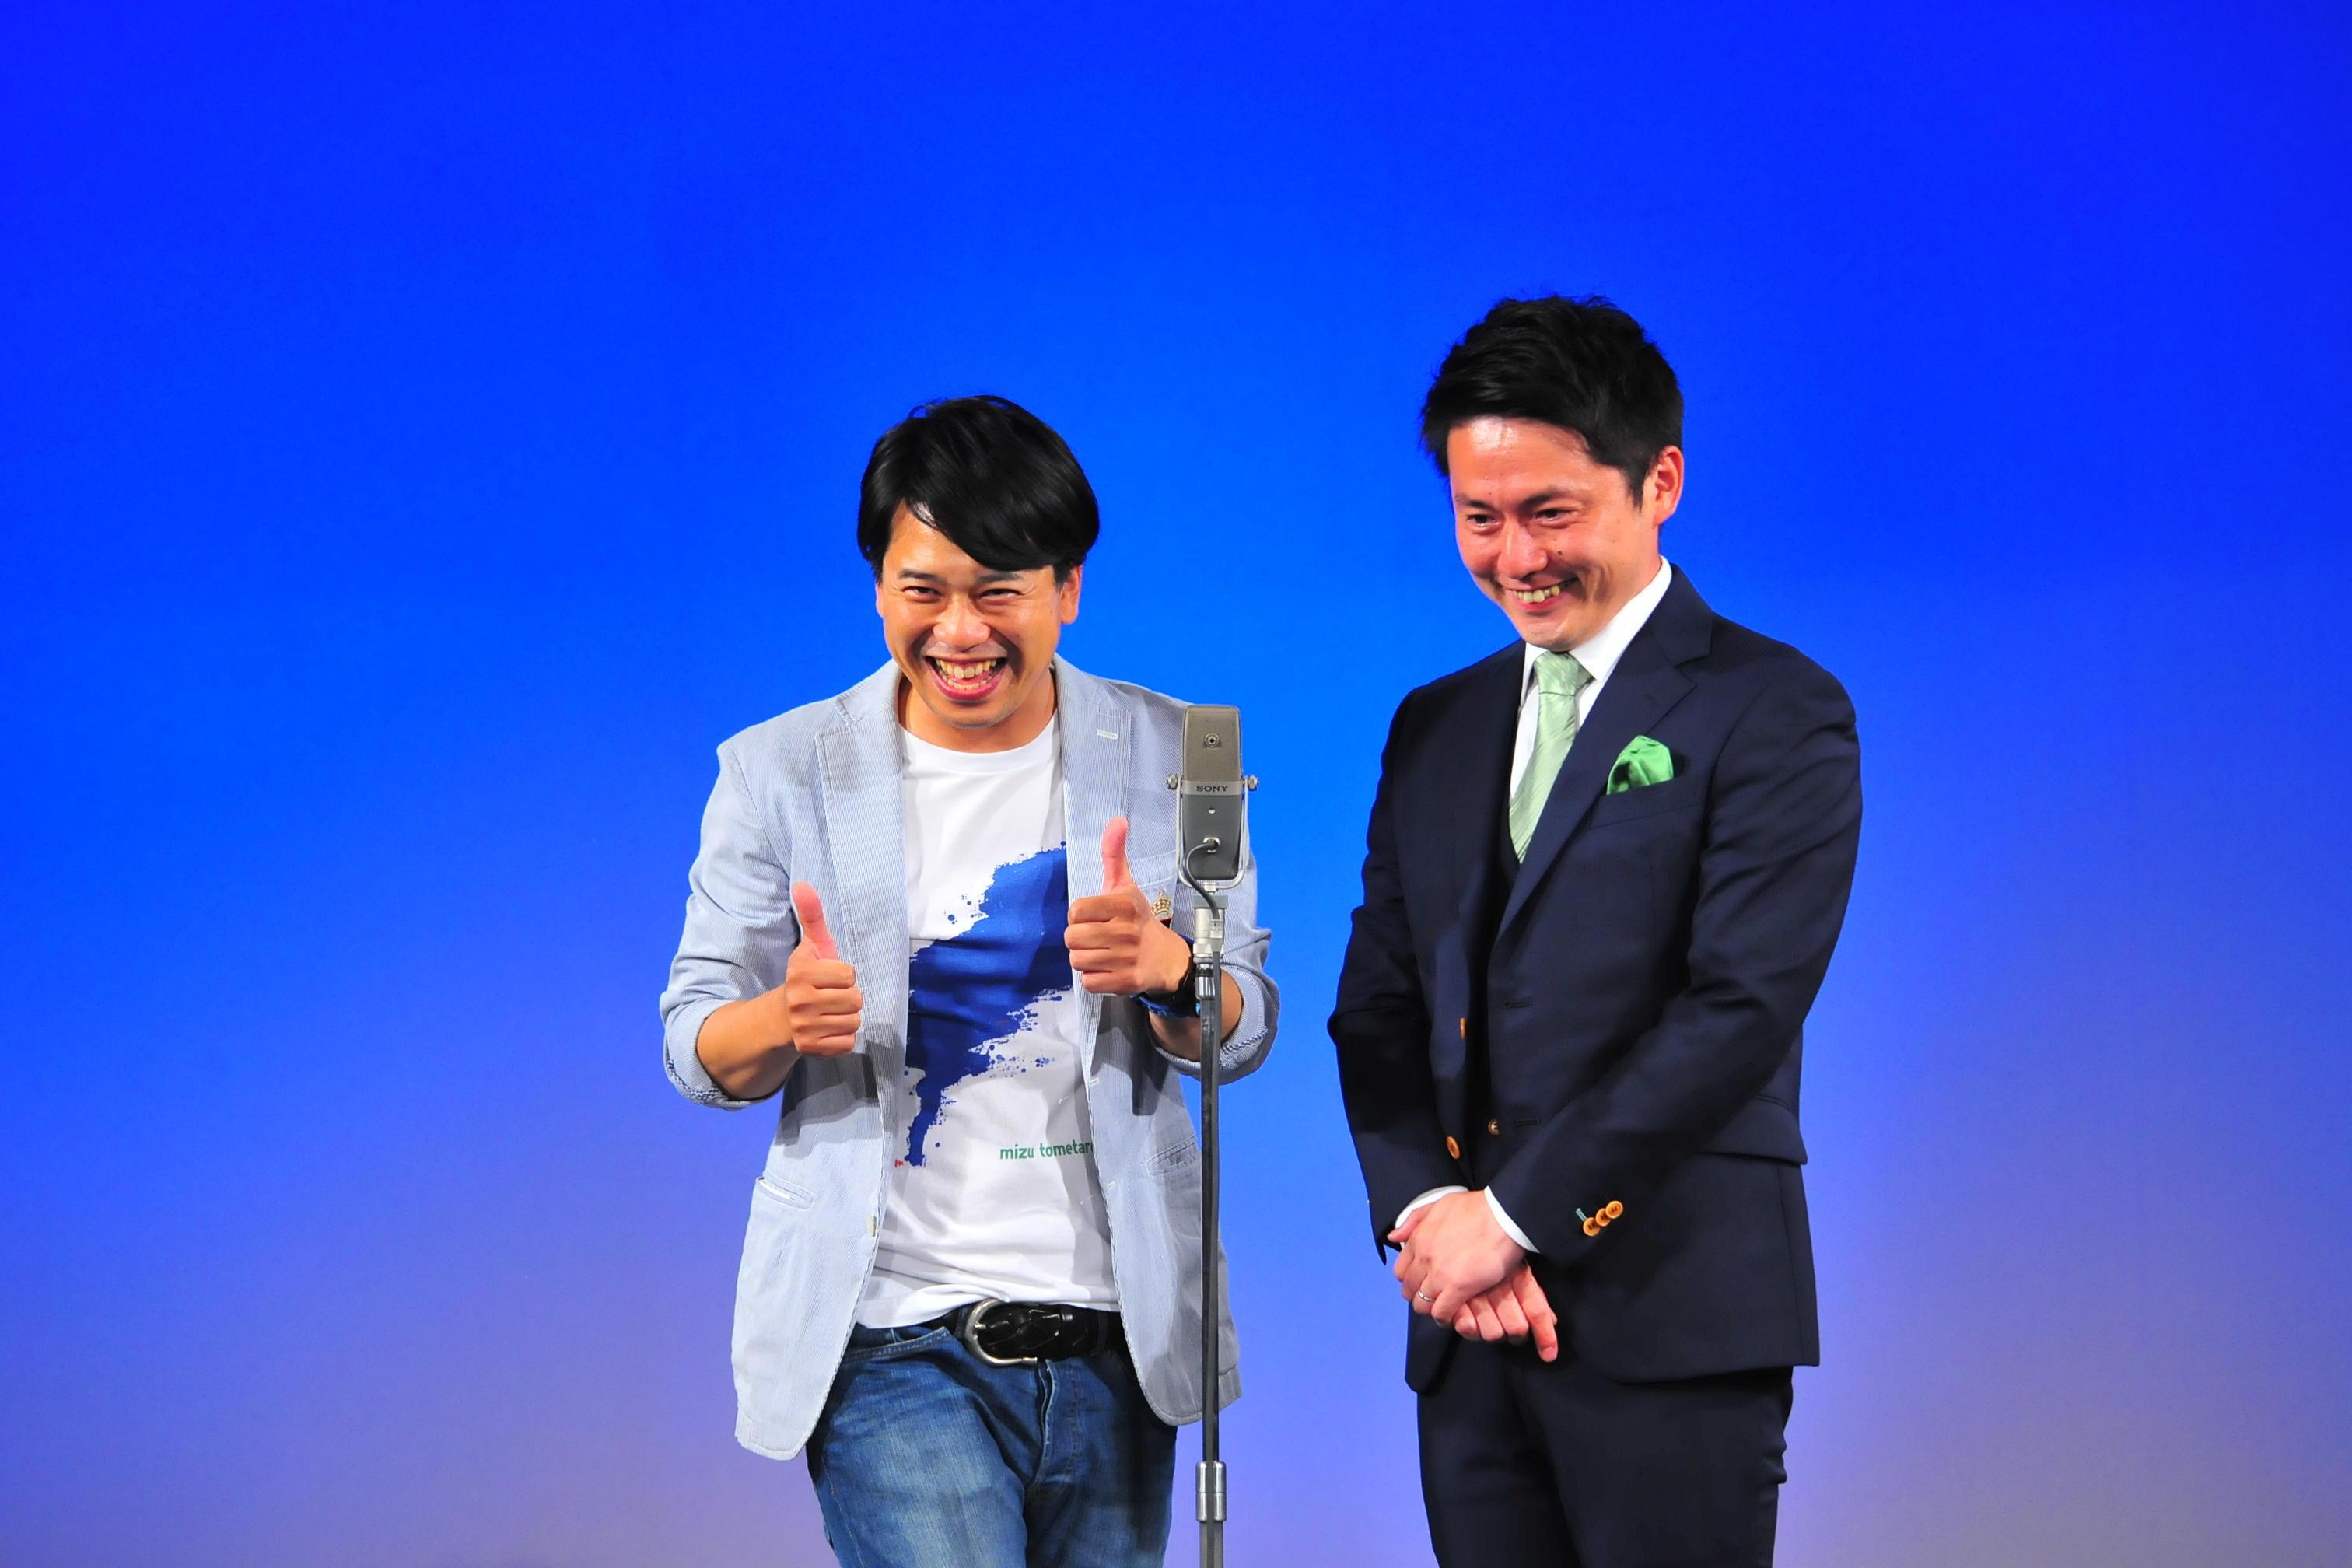 http://news.yoshimoto.co.jp/20160516144108-8884d5807372aa4725729e290babe8e2cfa6ddfb.jpg